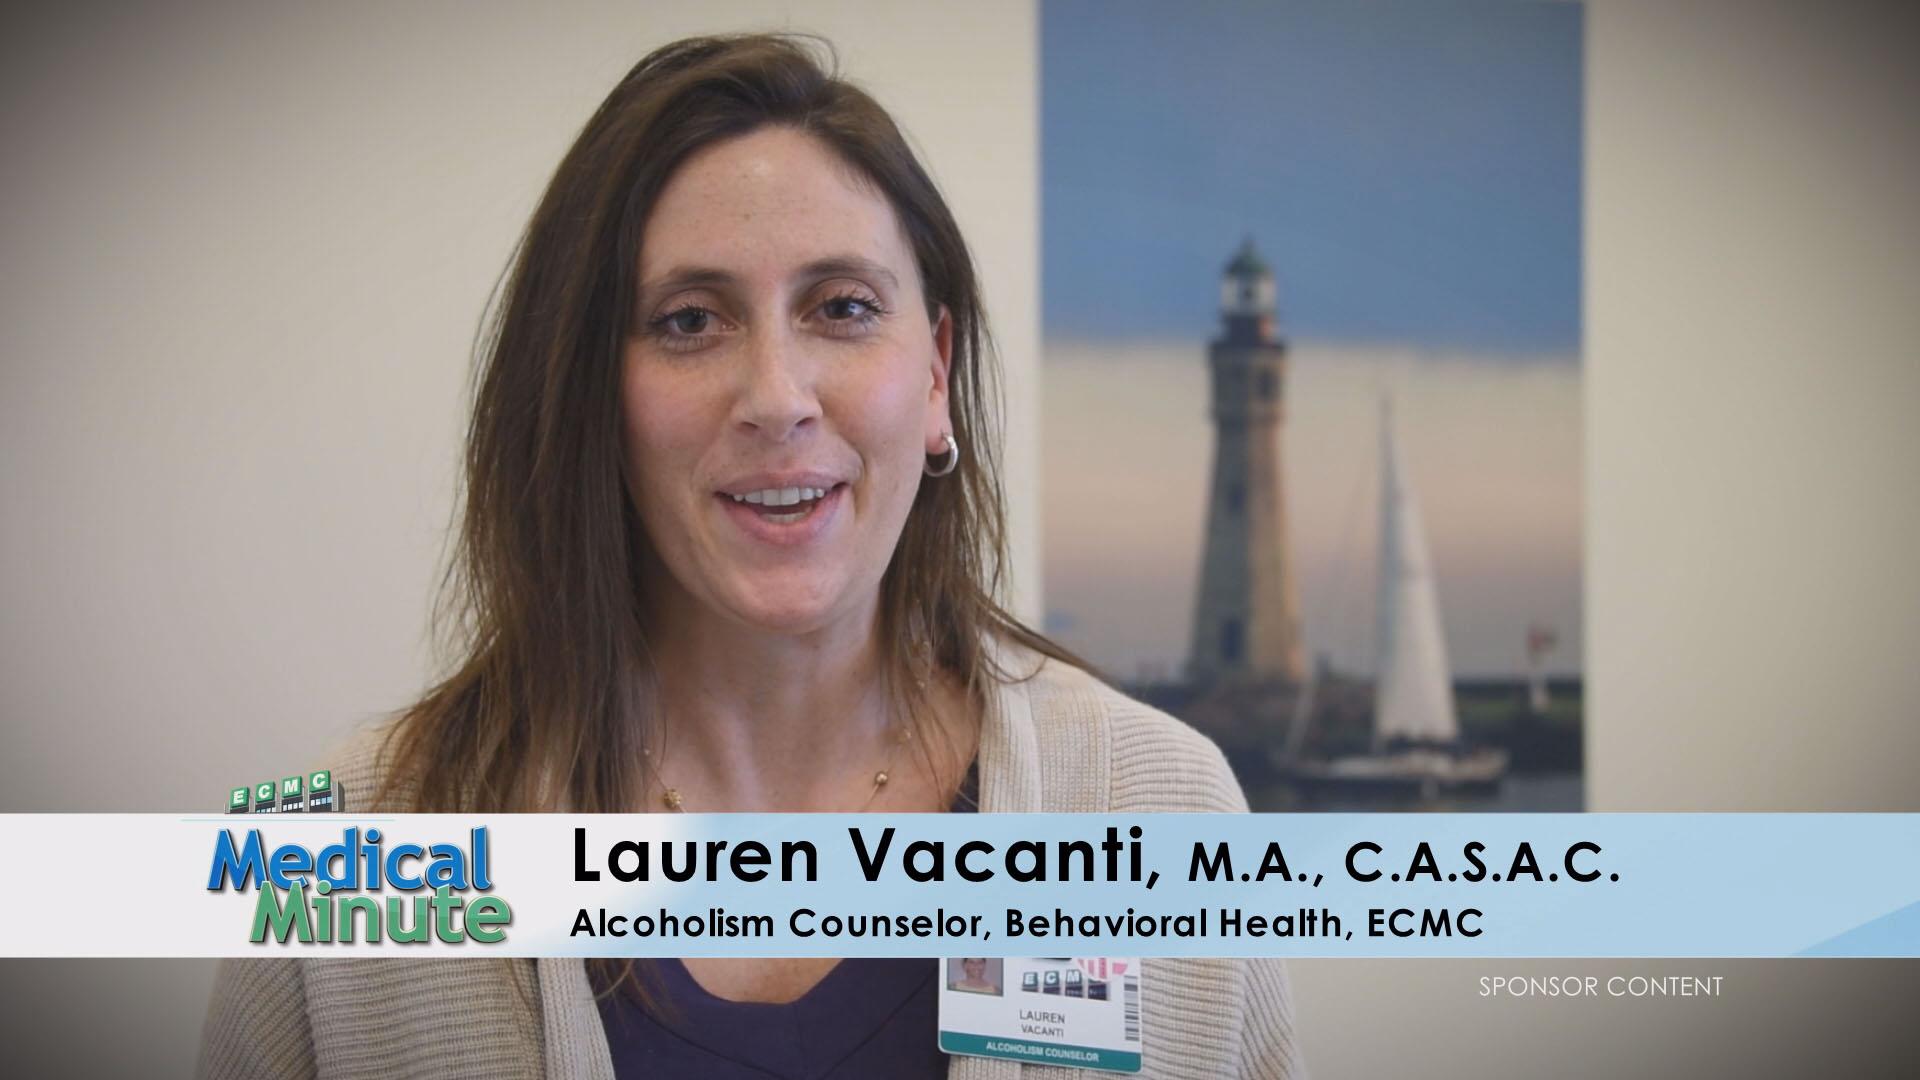 ECMC Medical Minute LaurenVacanti ChemicalDependency 053016 STILL